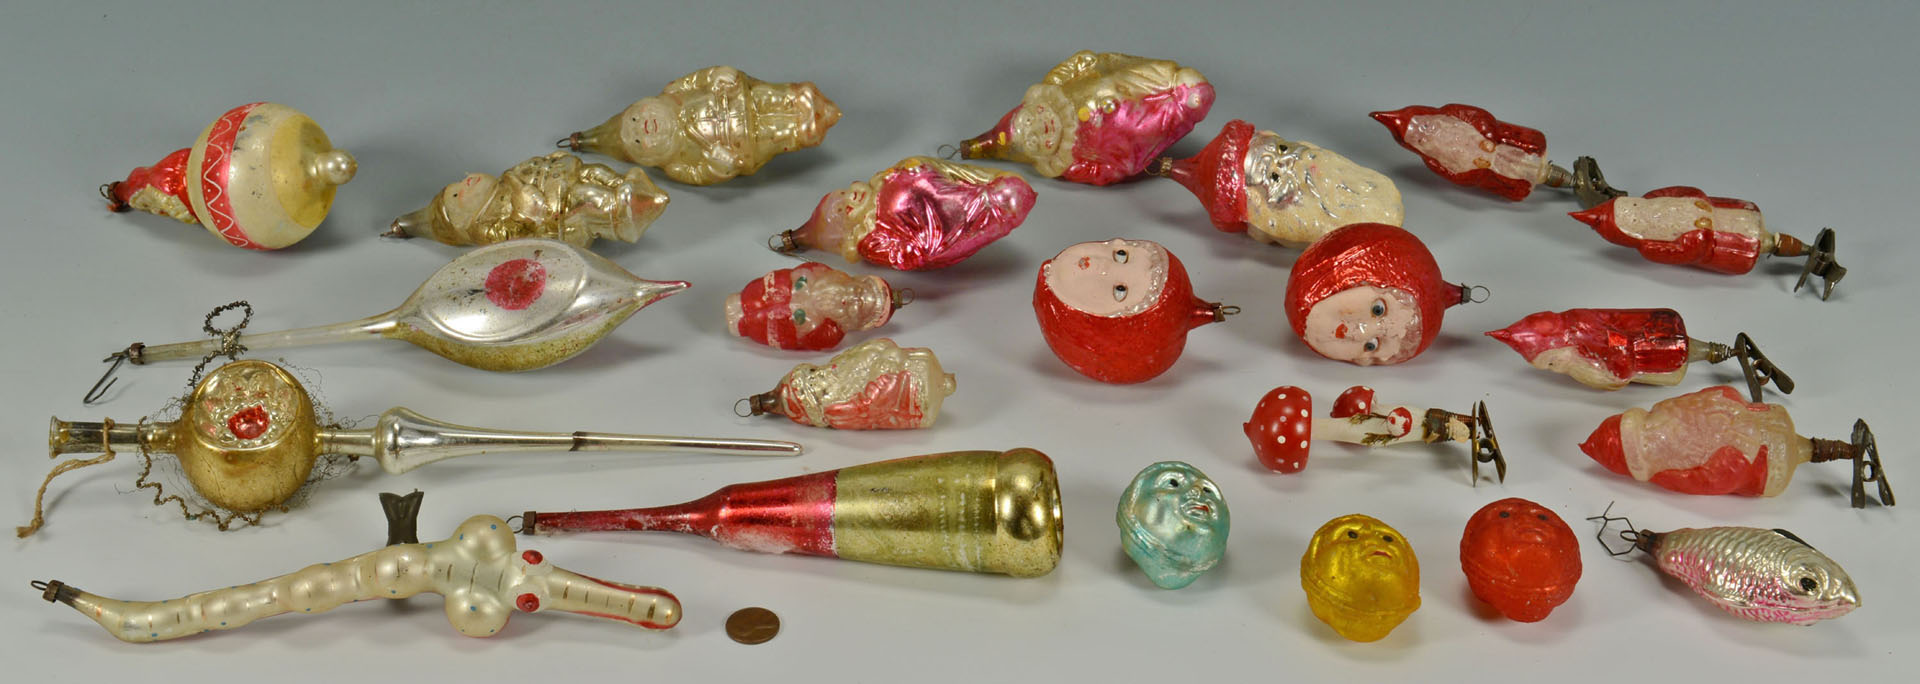 Lot 523: 23 Early glass Christmas Ornaments, Santa, Clowns